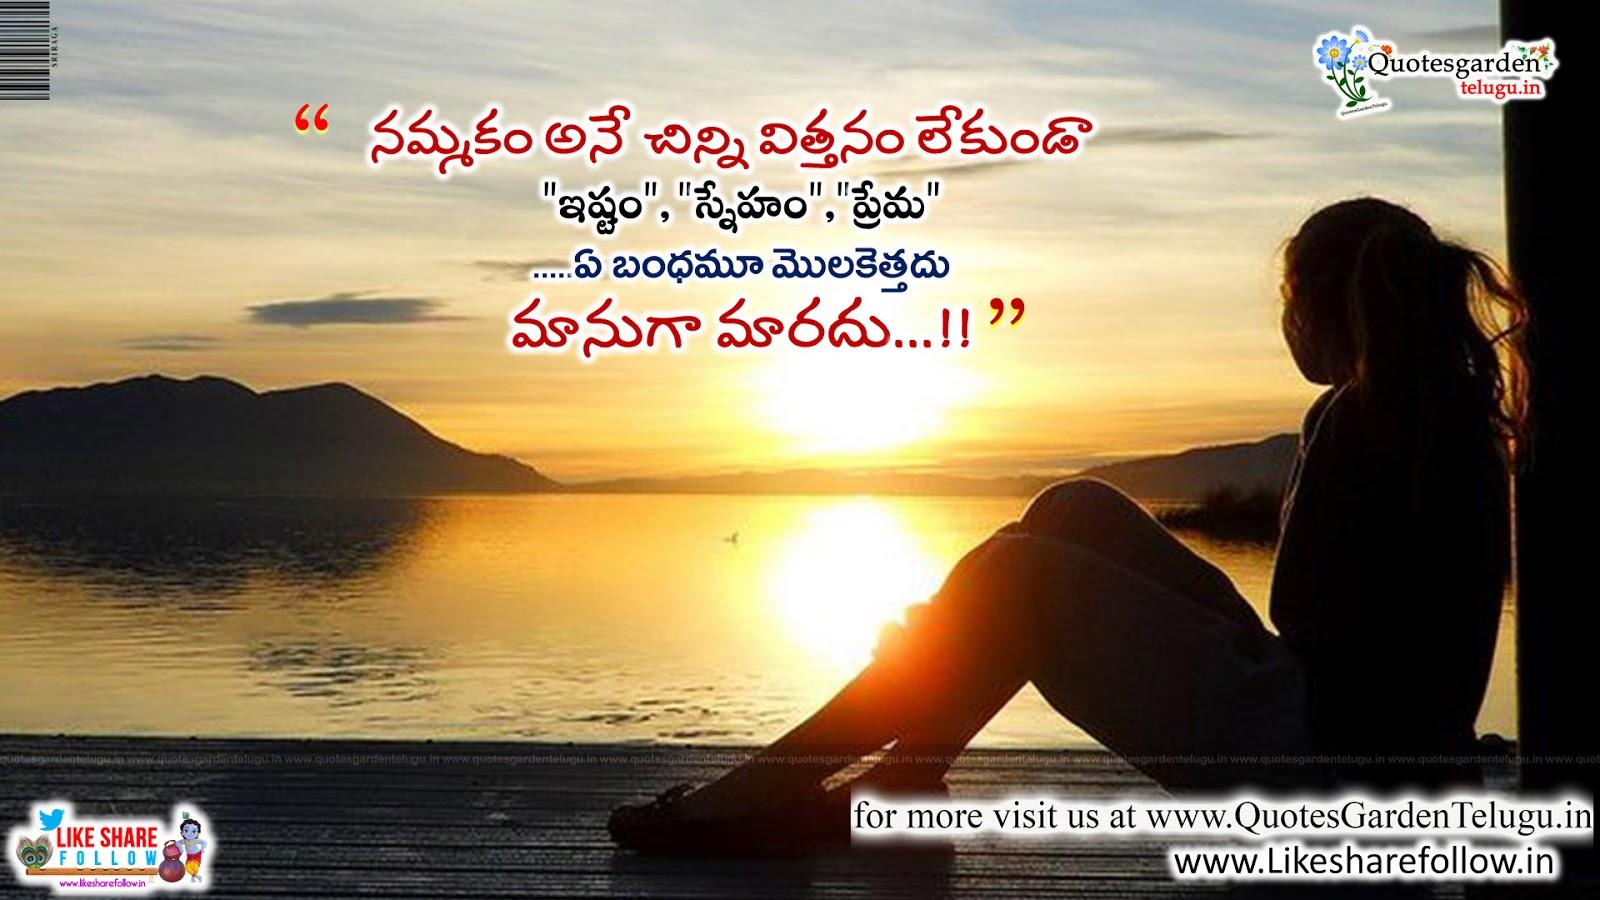 Telugu Love Quotes Images Free Download Quotes Garden Telugu Telugu Quotes English Quotes Hindi Quotes